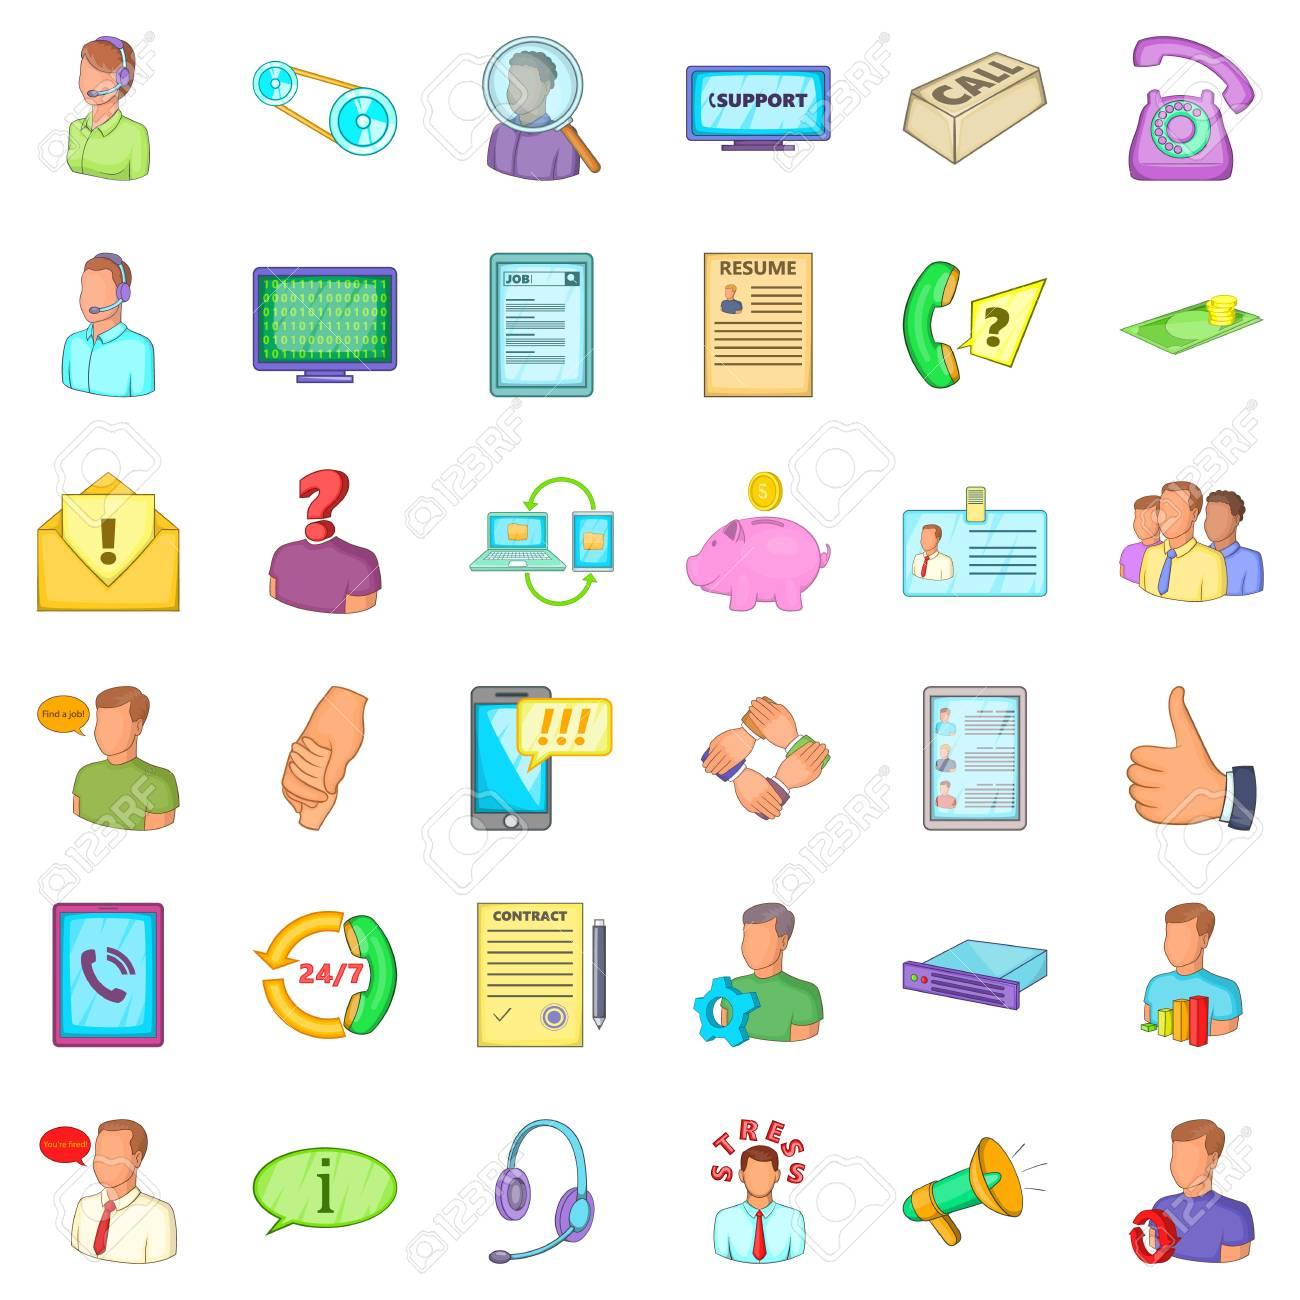 business process icons set